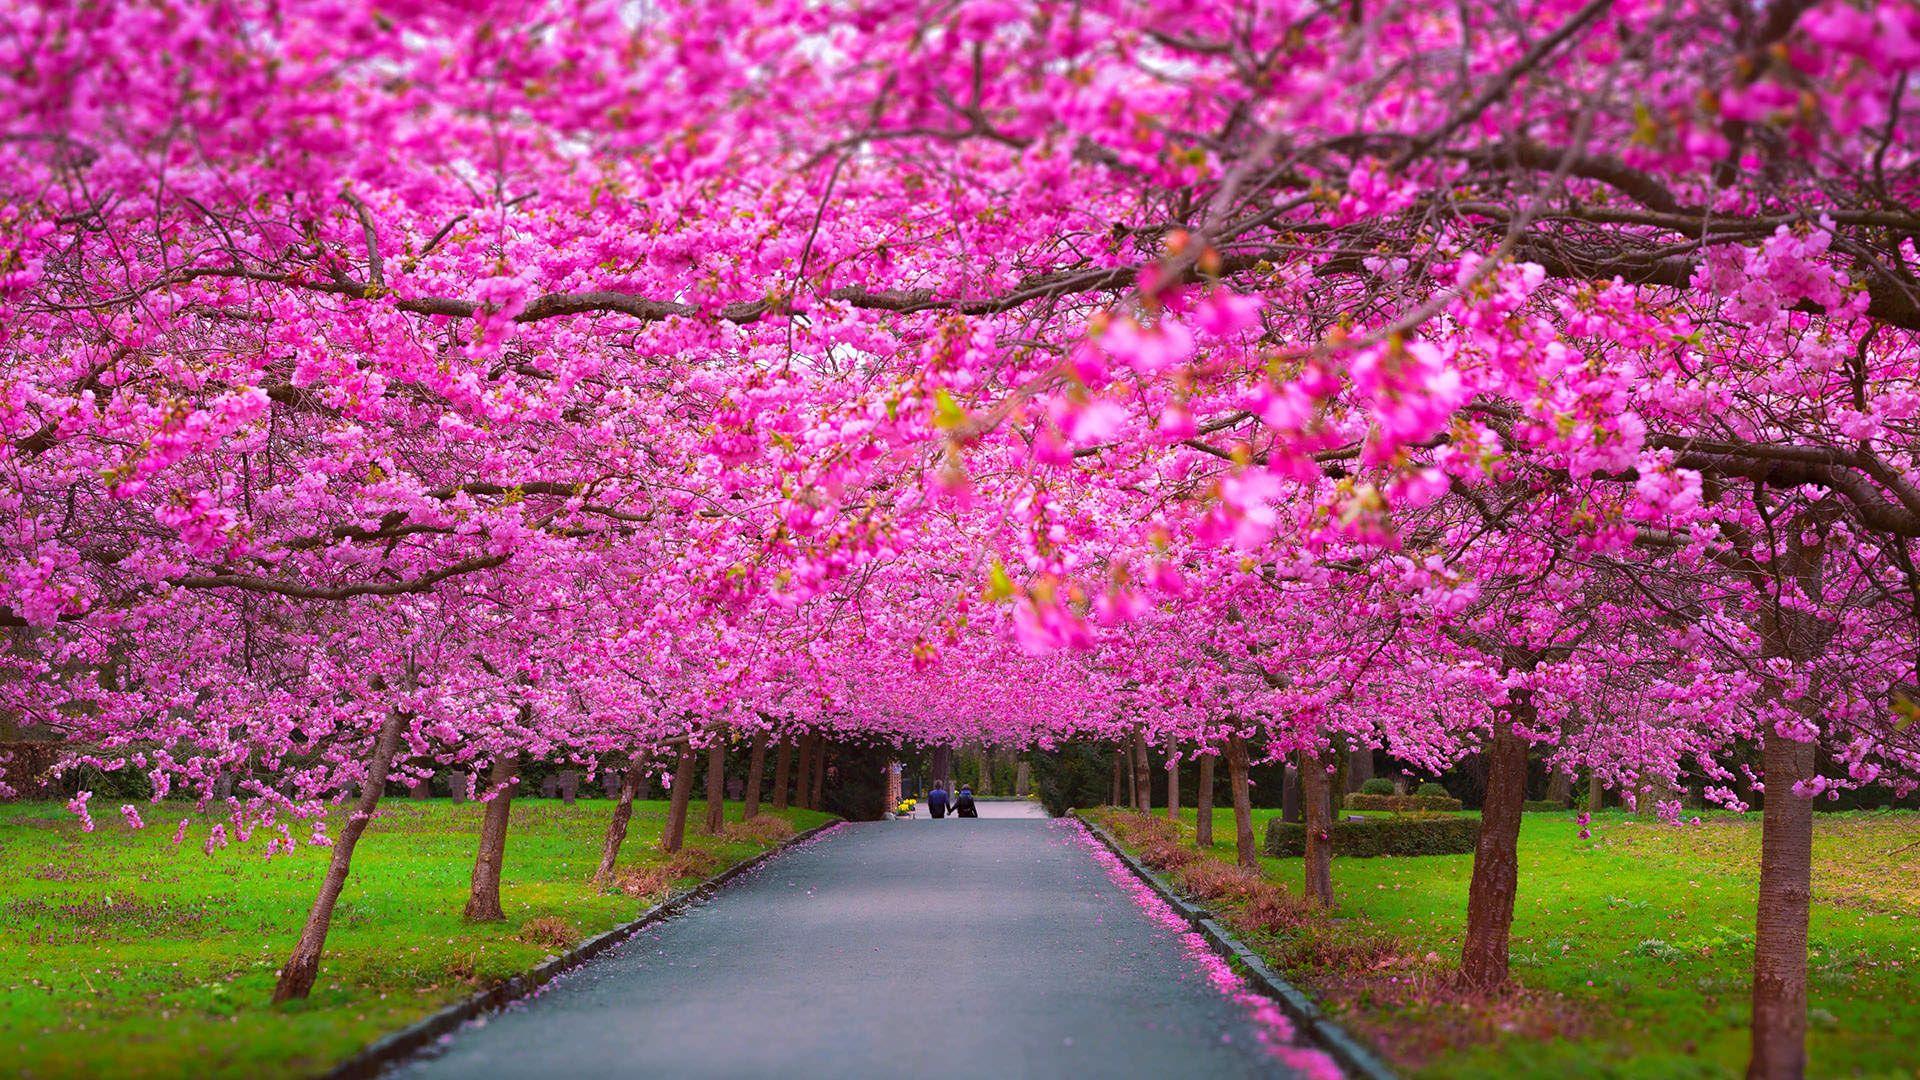 Beautiful Road With Beautiful Tree 1920x1080 Spring Wallpaper Hd Spring Scenery Spring Wallpaper